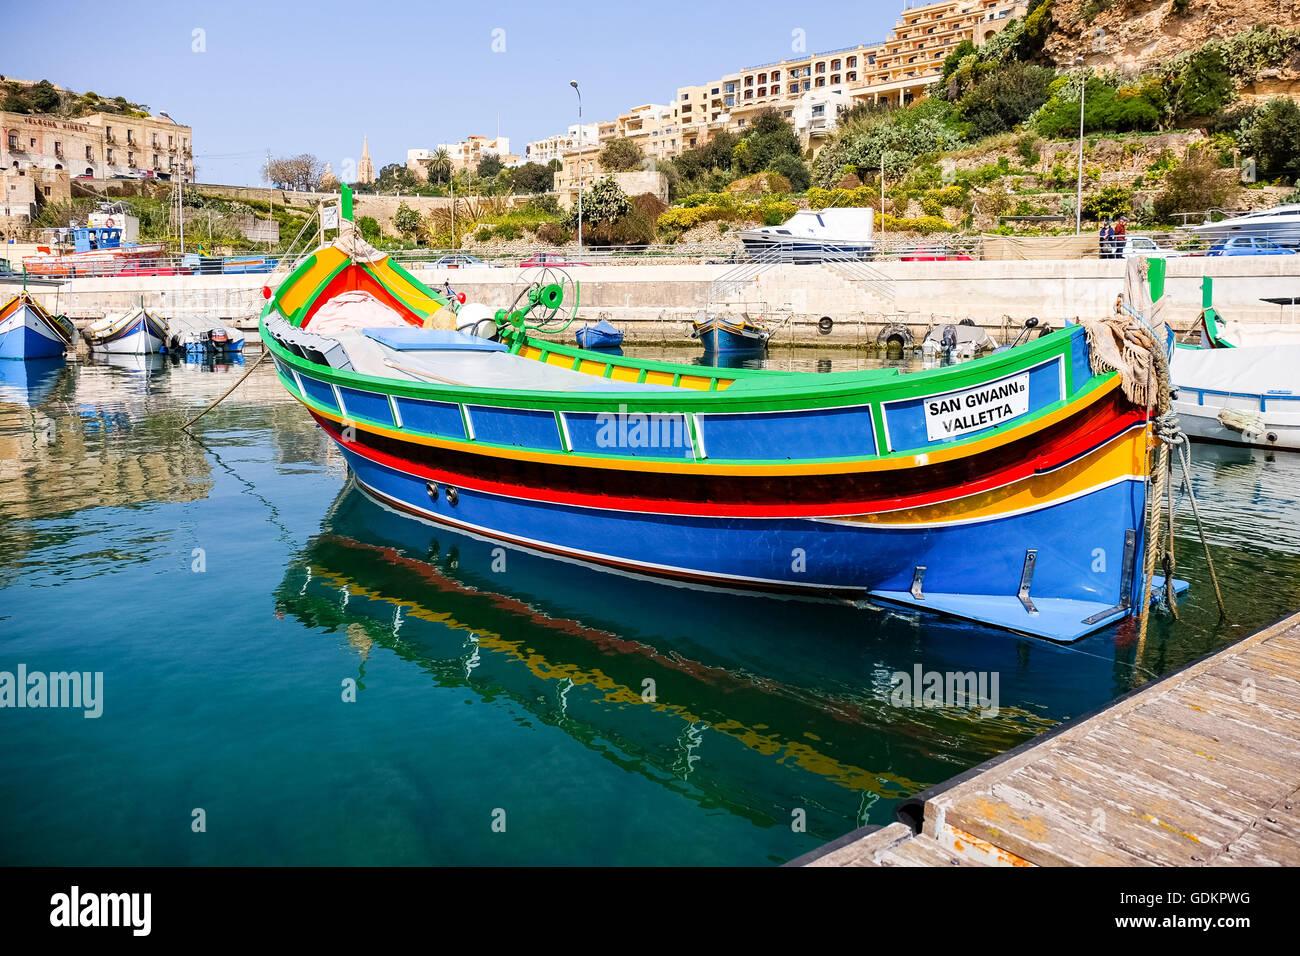 MGARR, GOZO ISLAND, MALTESE ISLANDS - APRIL 17, 2015:Marsaxlokk, a traditional maltese village  fishing boat, Mgarr - Stock Image